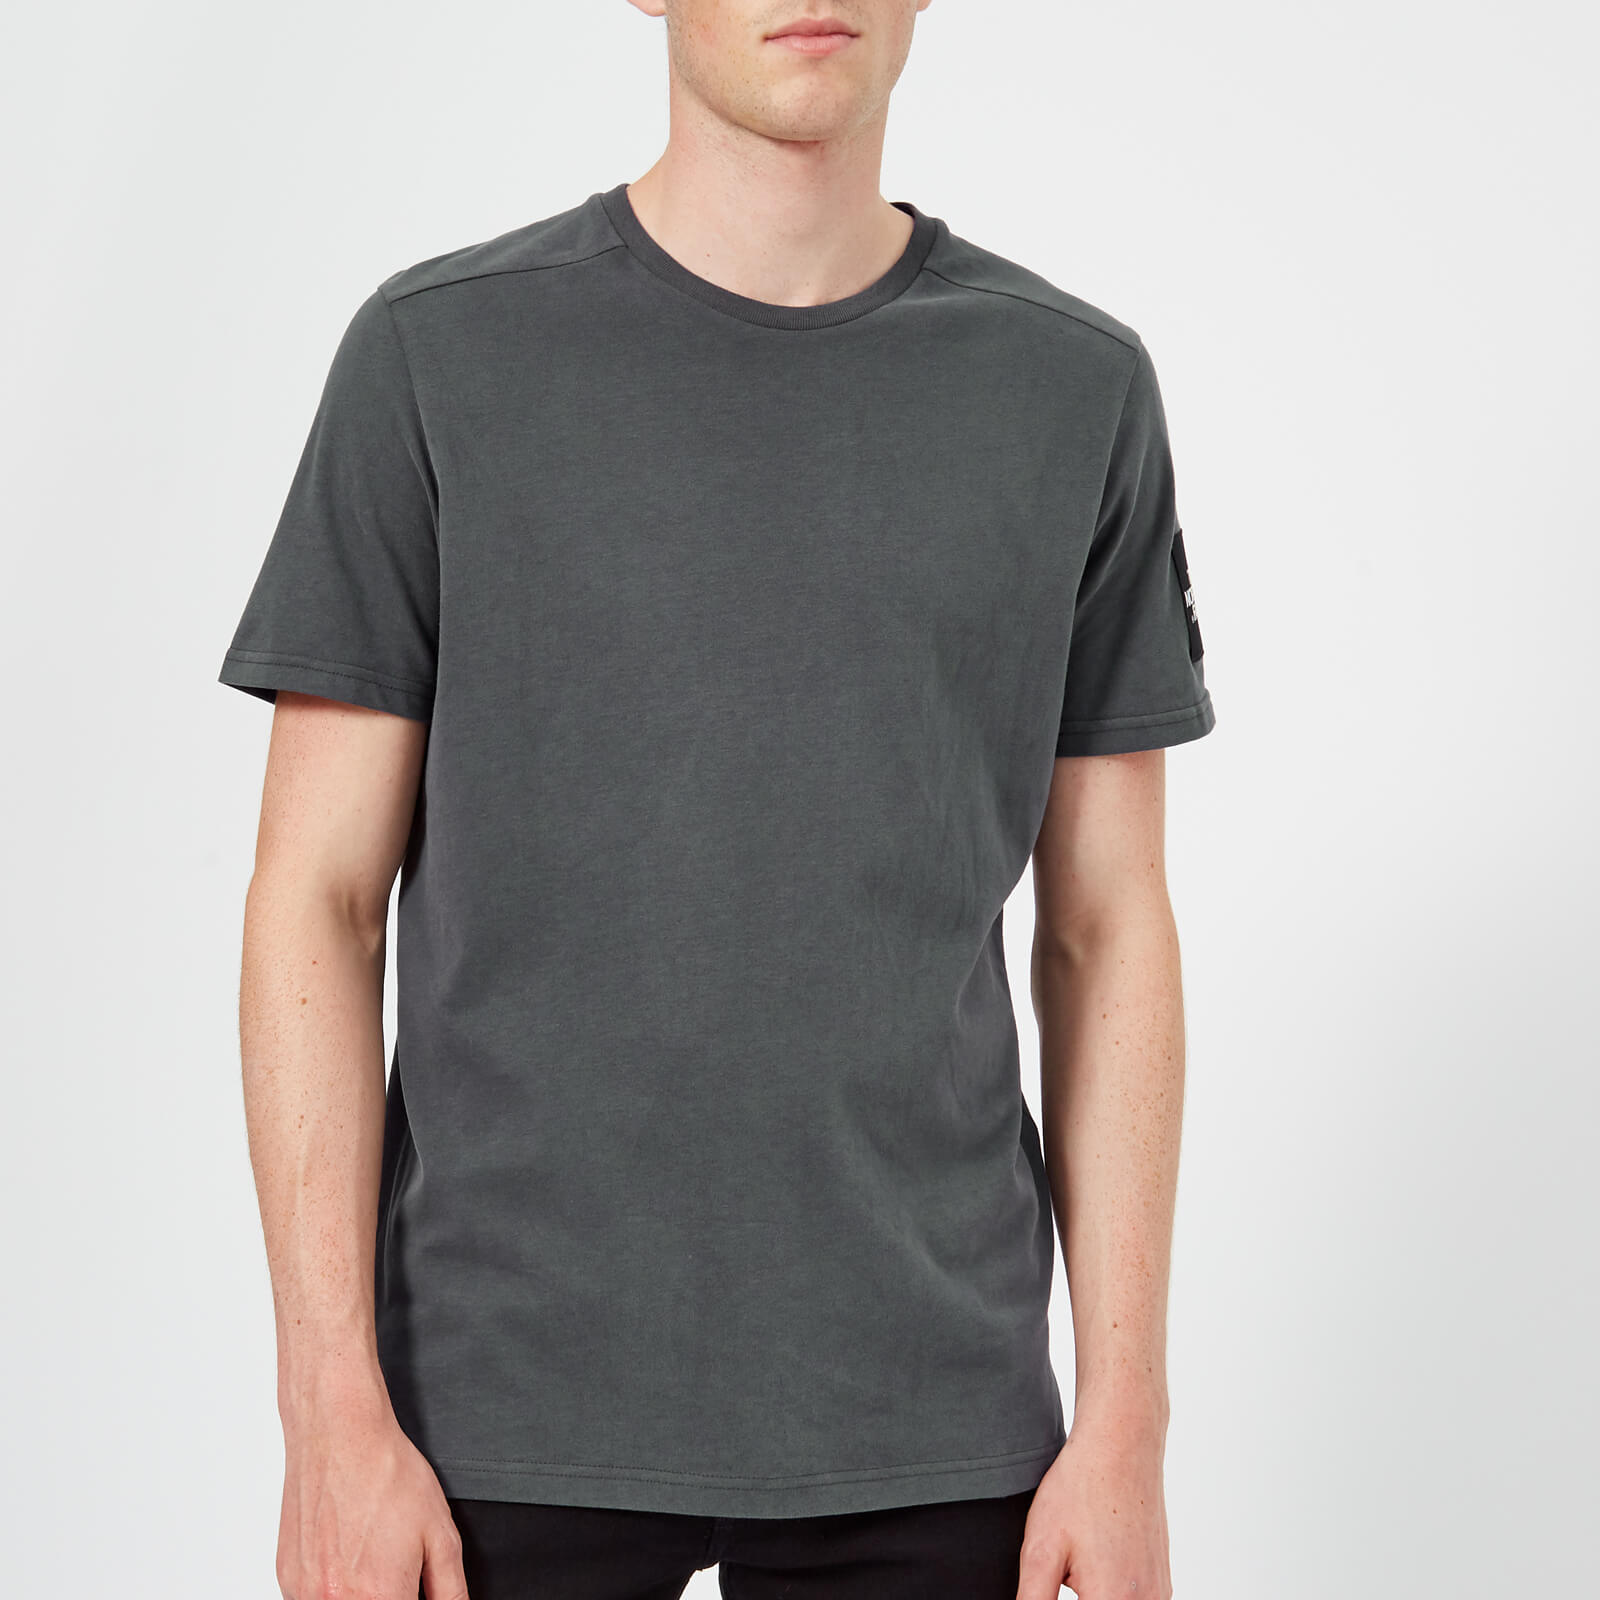 f301fcd62 The North Face Men's Fine 2 Short Sleeve T-Shirt - Asphalt Grey